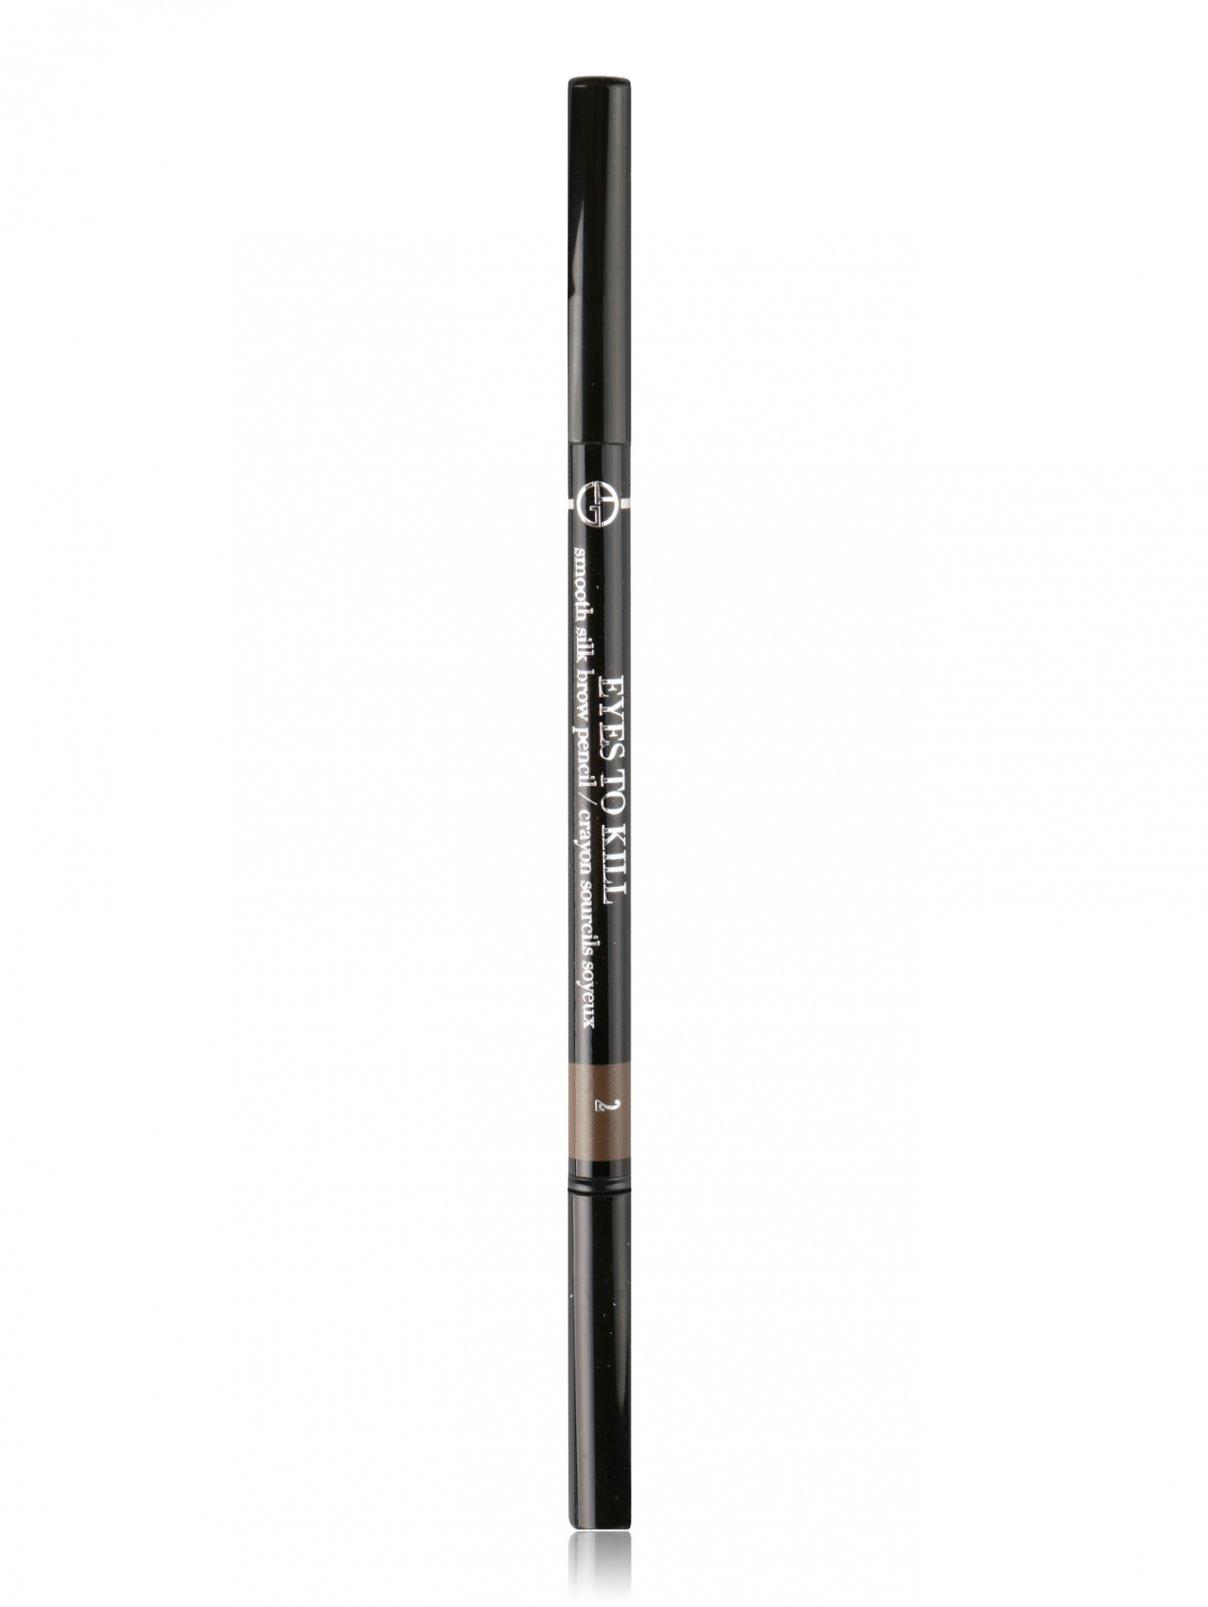 Карандаш для бровей оттенок - 2 SMOOTH SILK Giorgio Armani  –  Общий вид